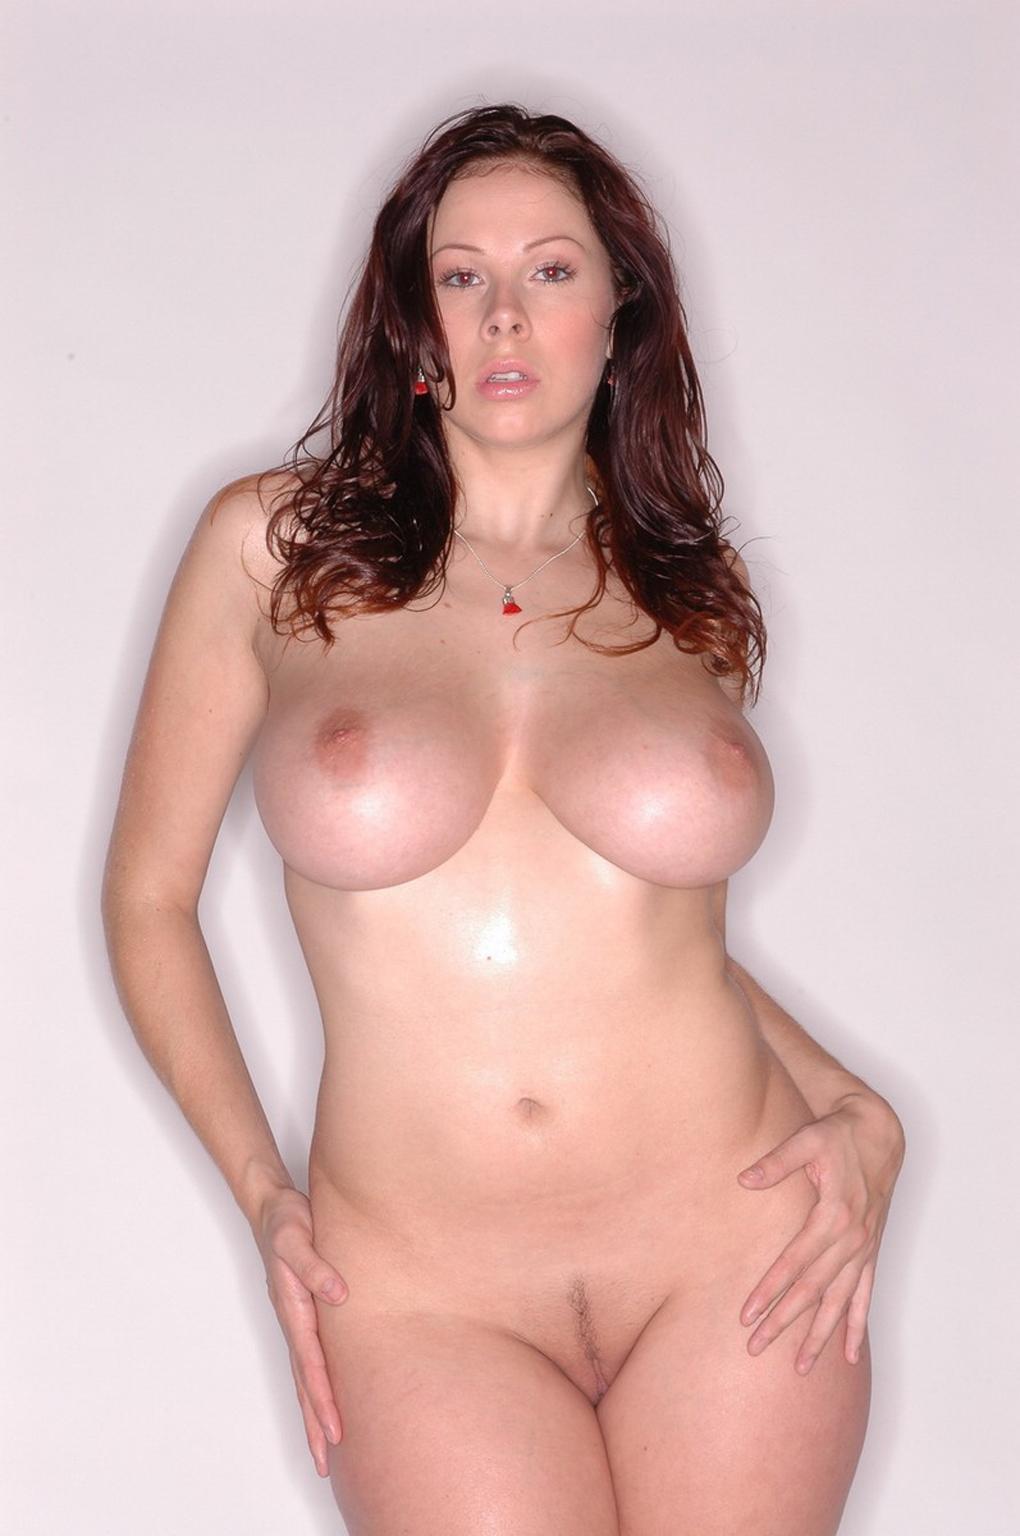 Gianna Michaels Pics